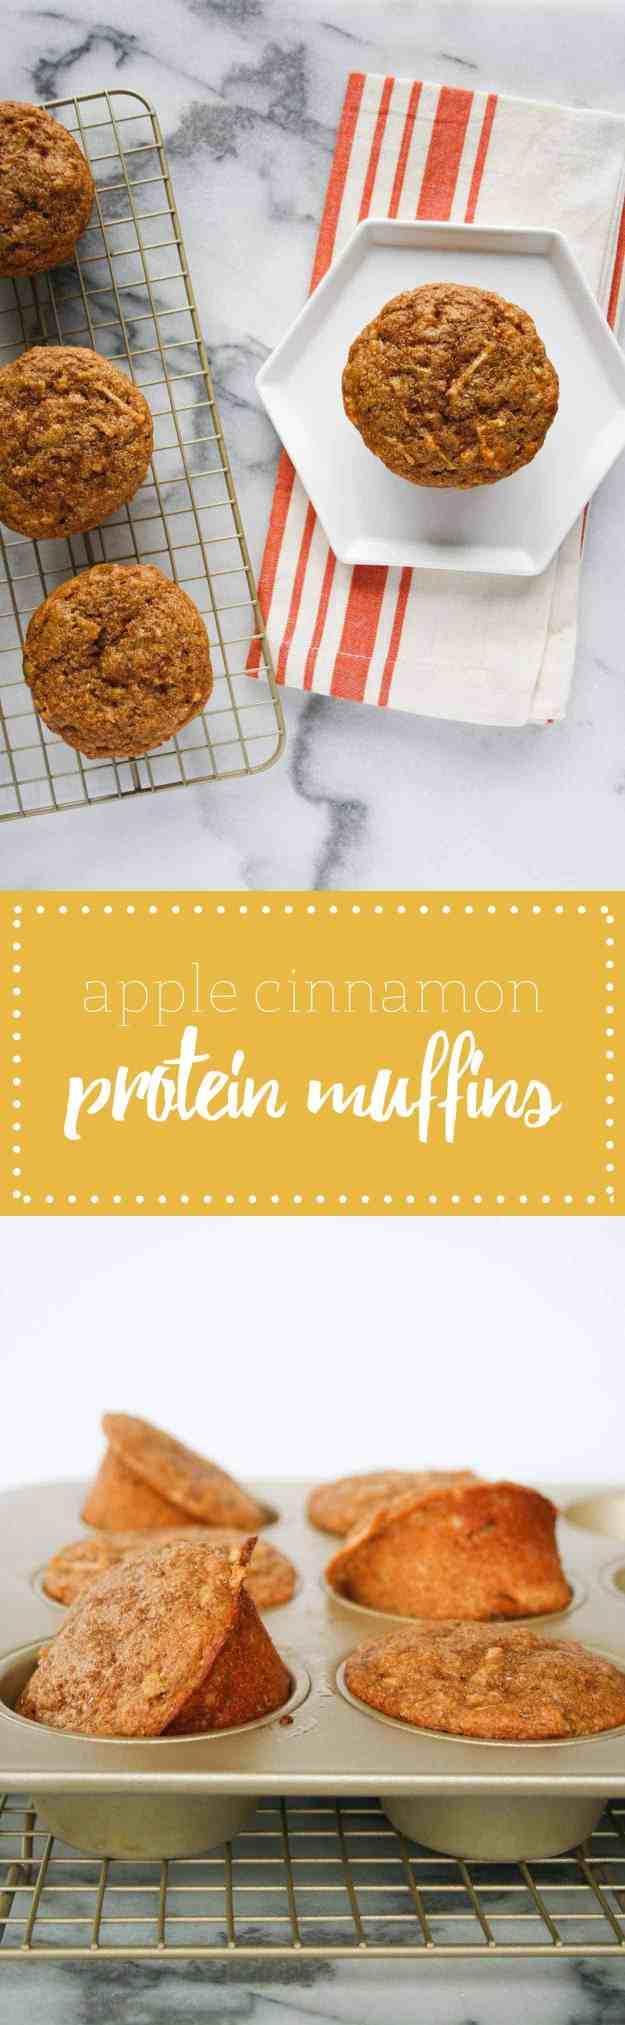 apple cinnamon protein muffins pinterest